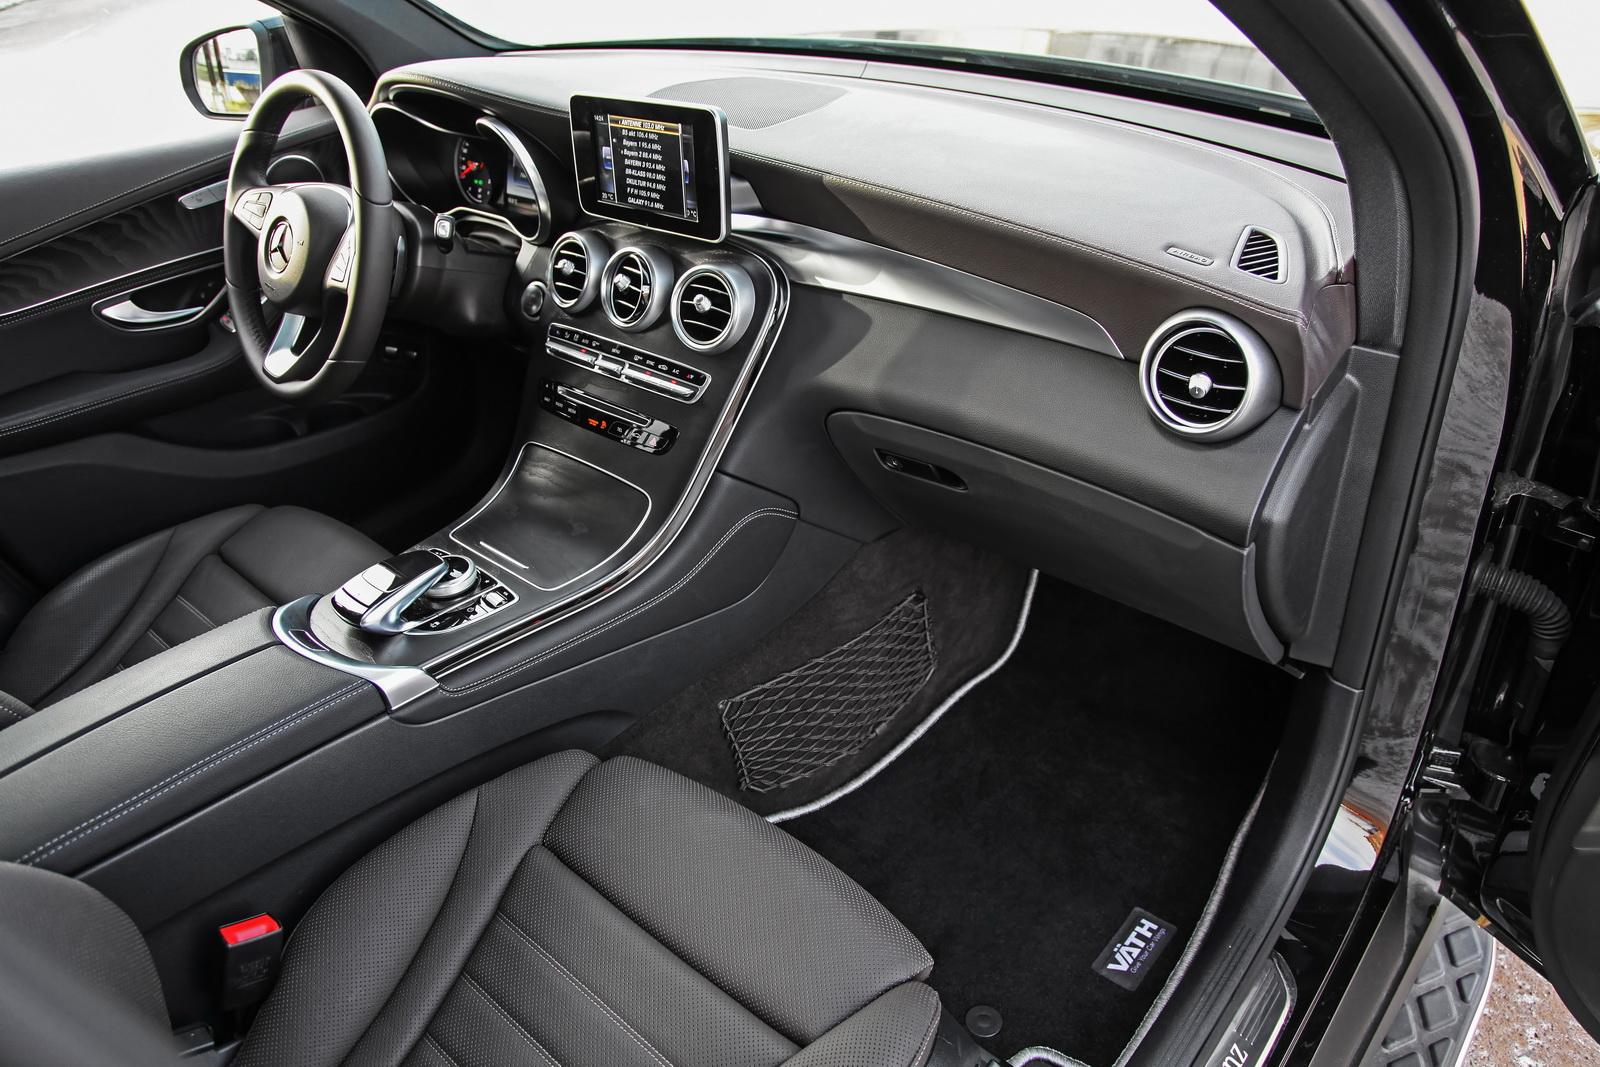 Mercedes_GLC220d_by_Vath_11